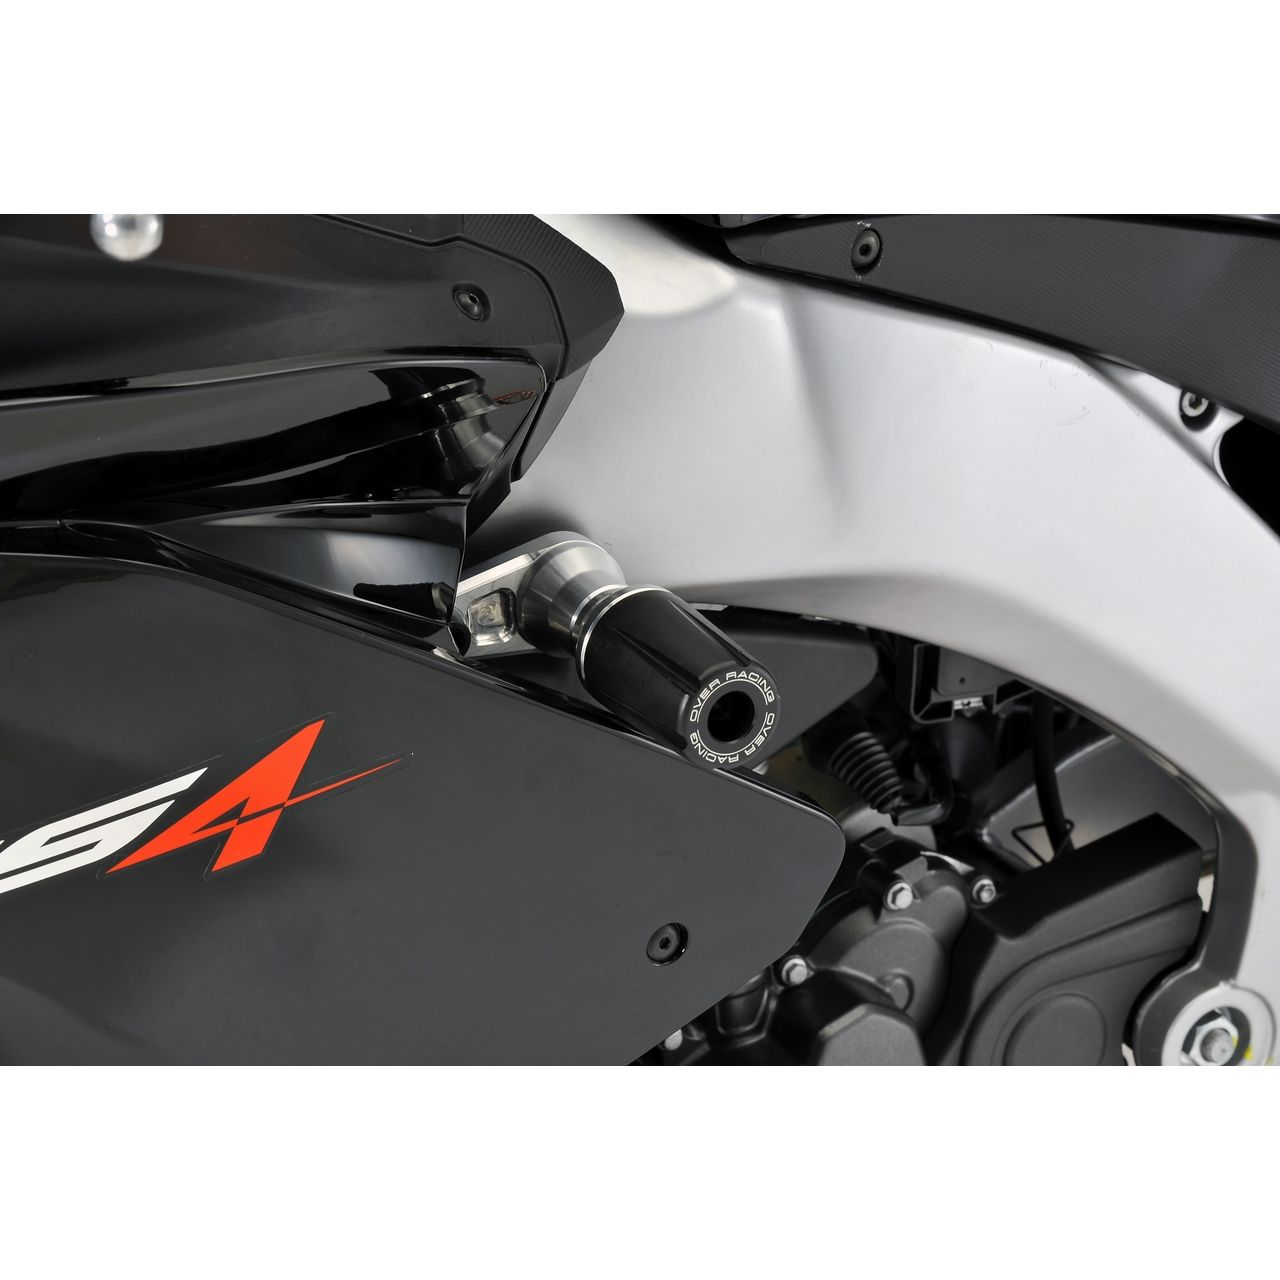 【OVER】Racing 滑塊(防倒球) - 「Webike-摩托百貨」